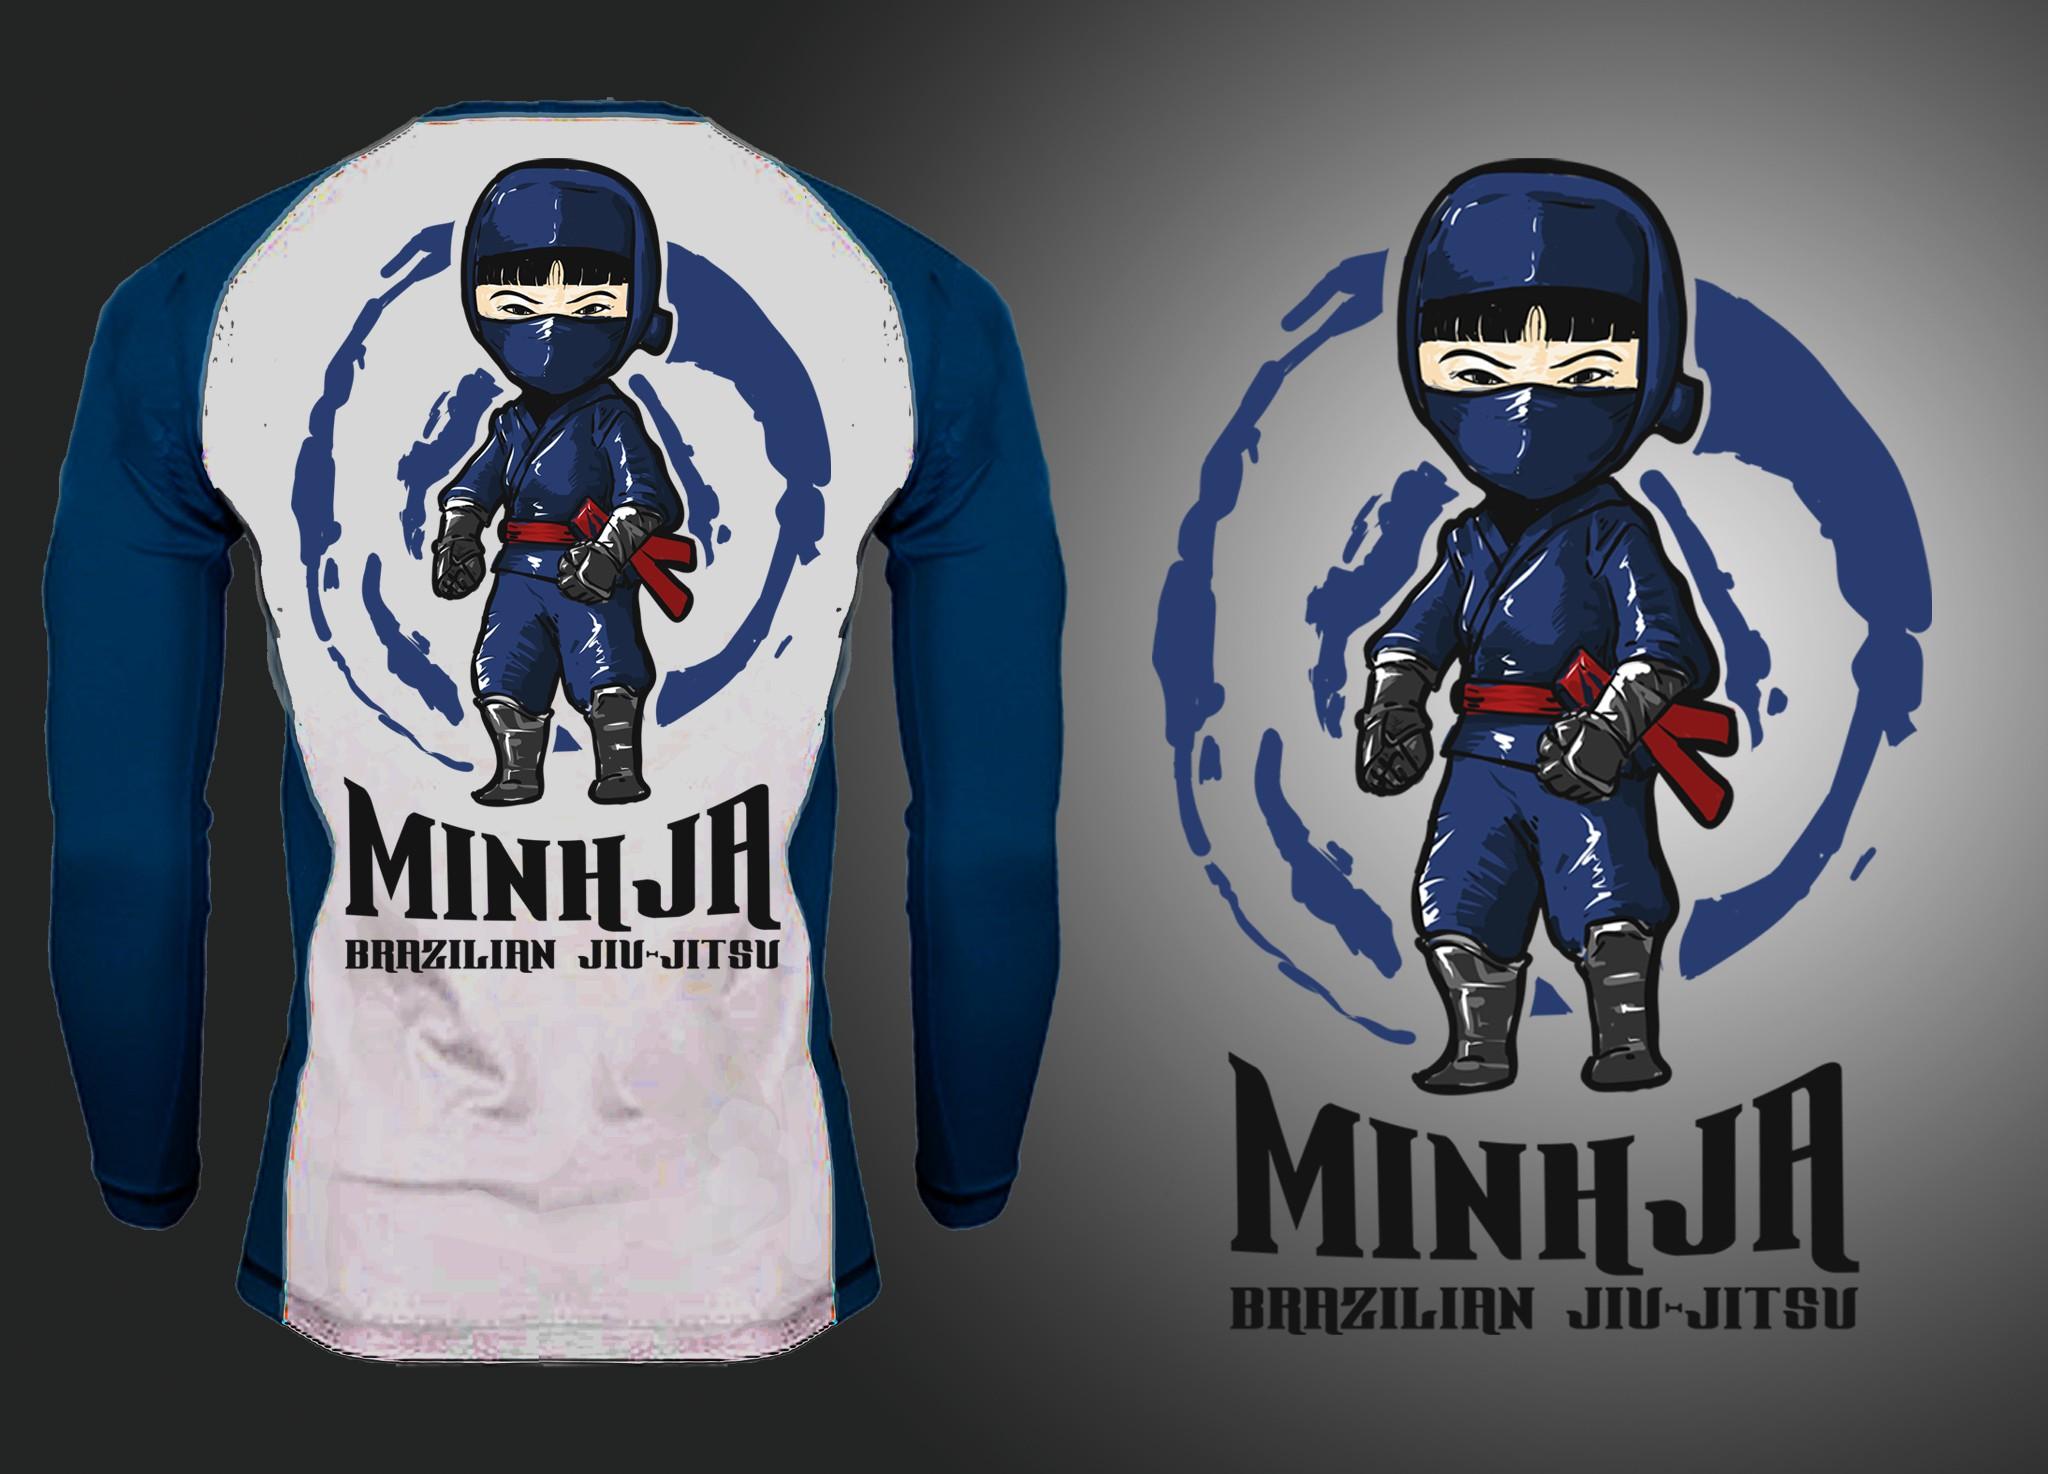 Female ninja on back of rash guard (Brazilian jiujitsu)